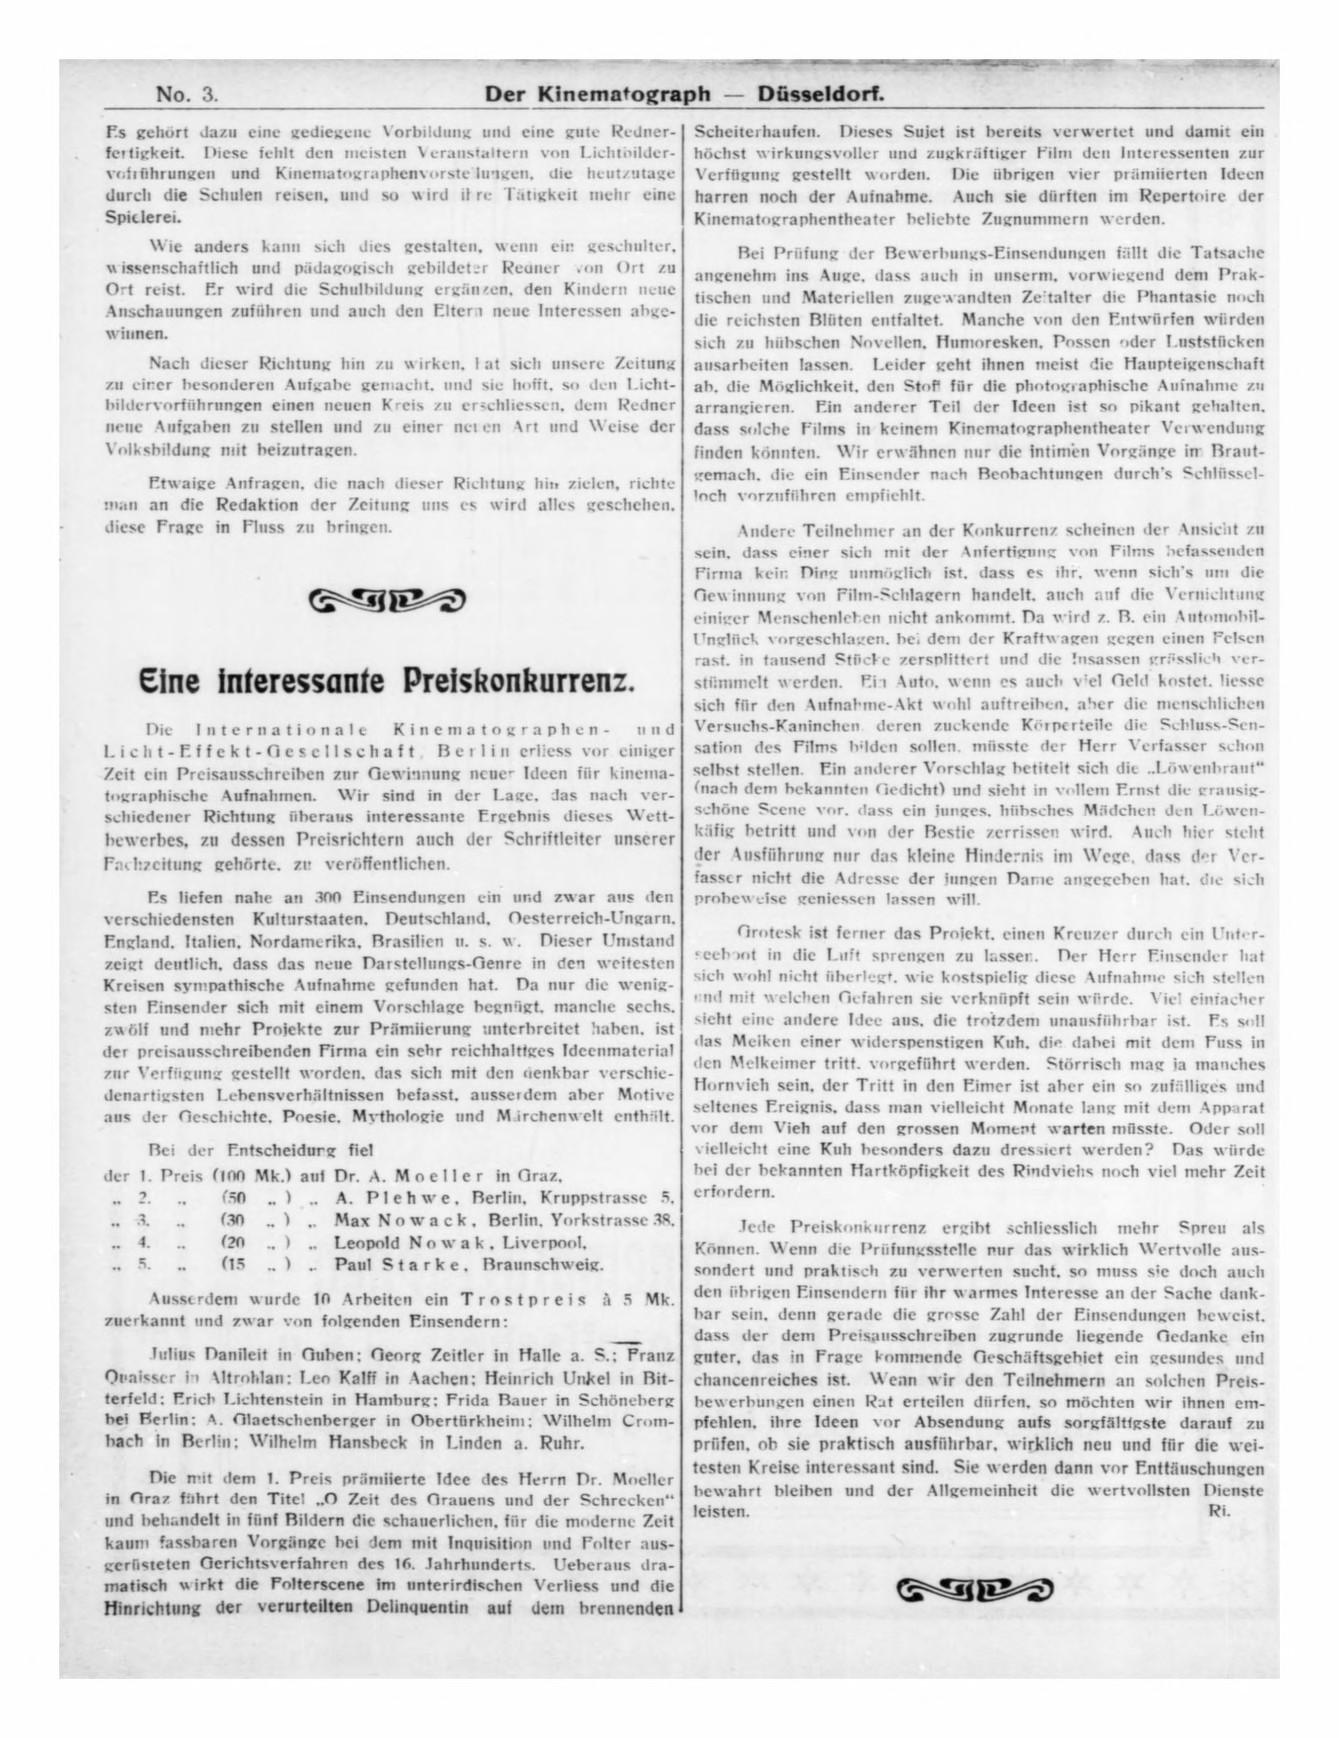 Kinematograph01-1907-01_jp2.zip&file=kinematograph01-1907-01_jp2%2fkinematograph01-1907-01_0027